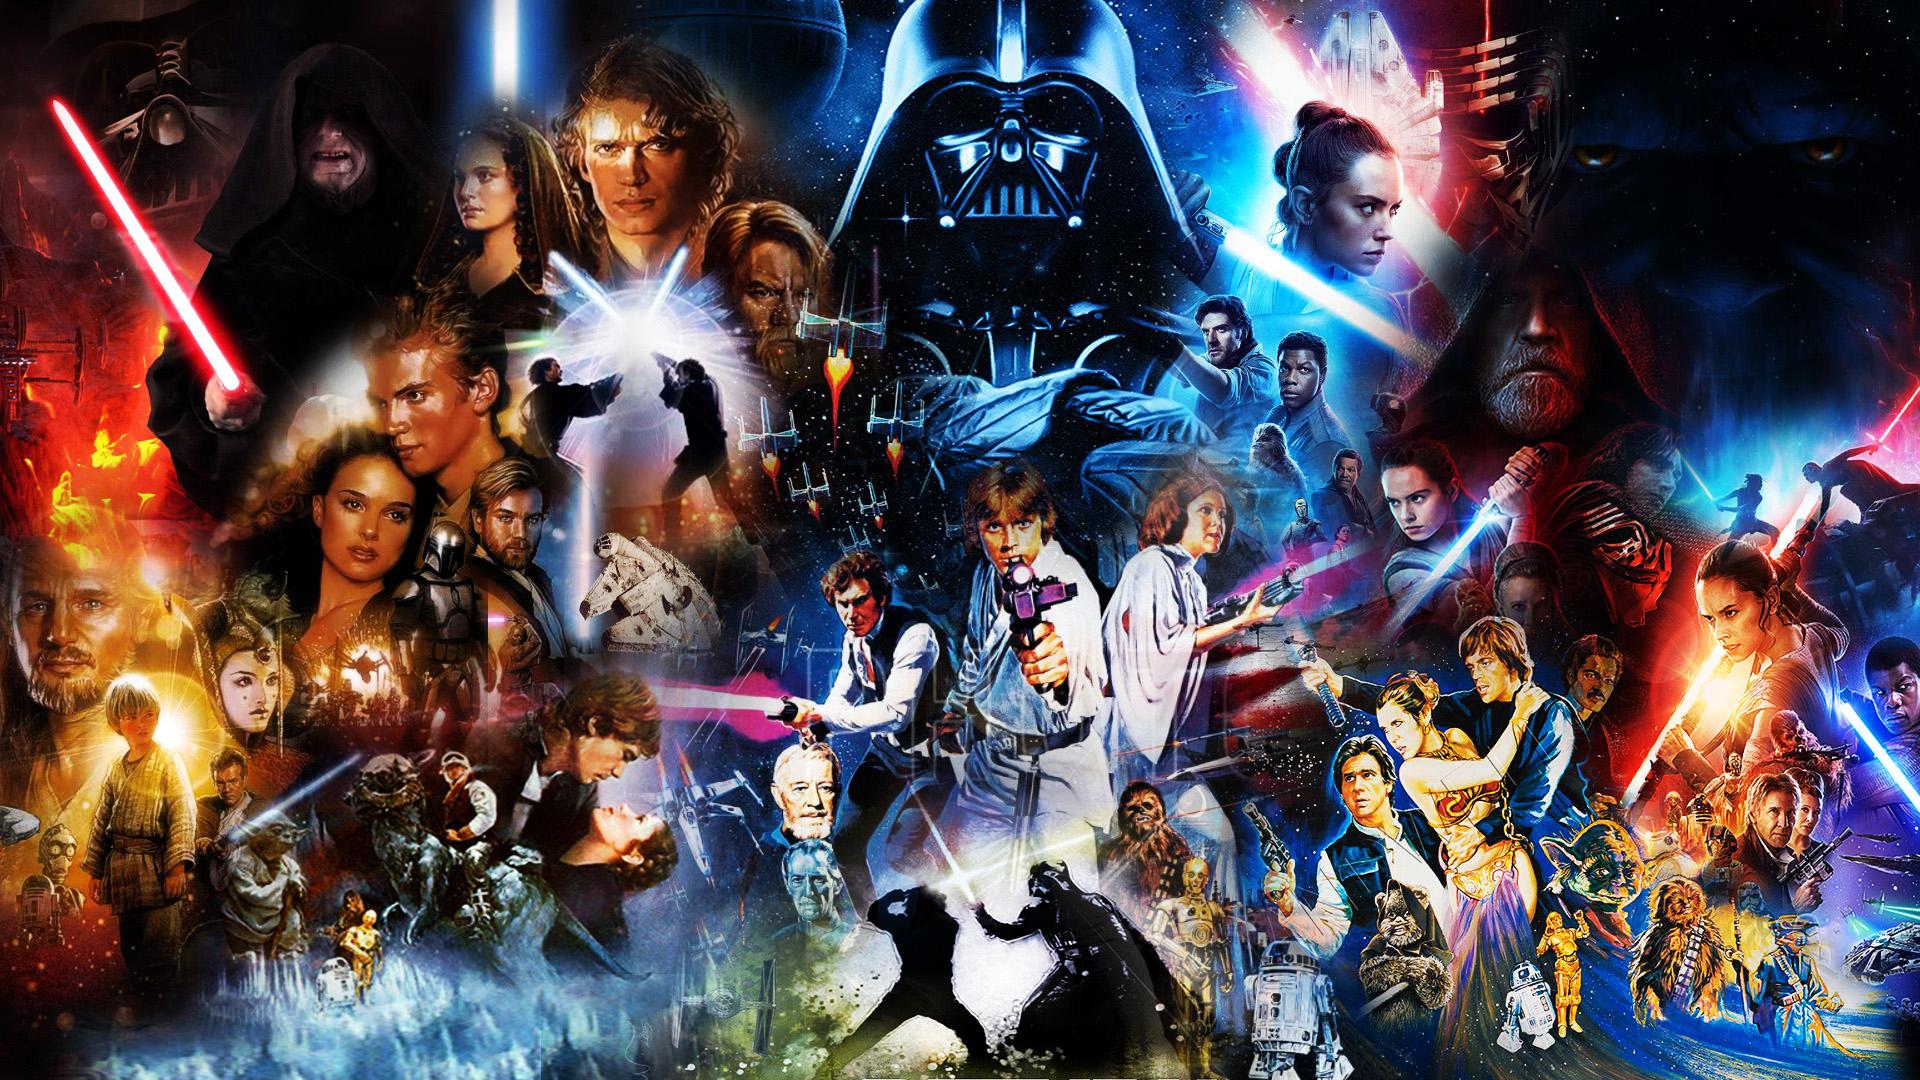 Star Wars Skywalker Saga Wallpaper By Thekingblader995 On Deviantart